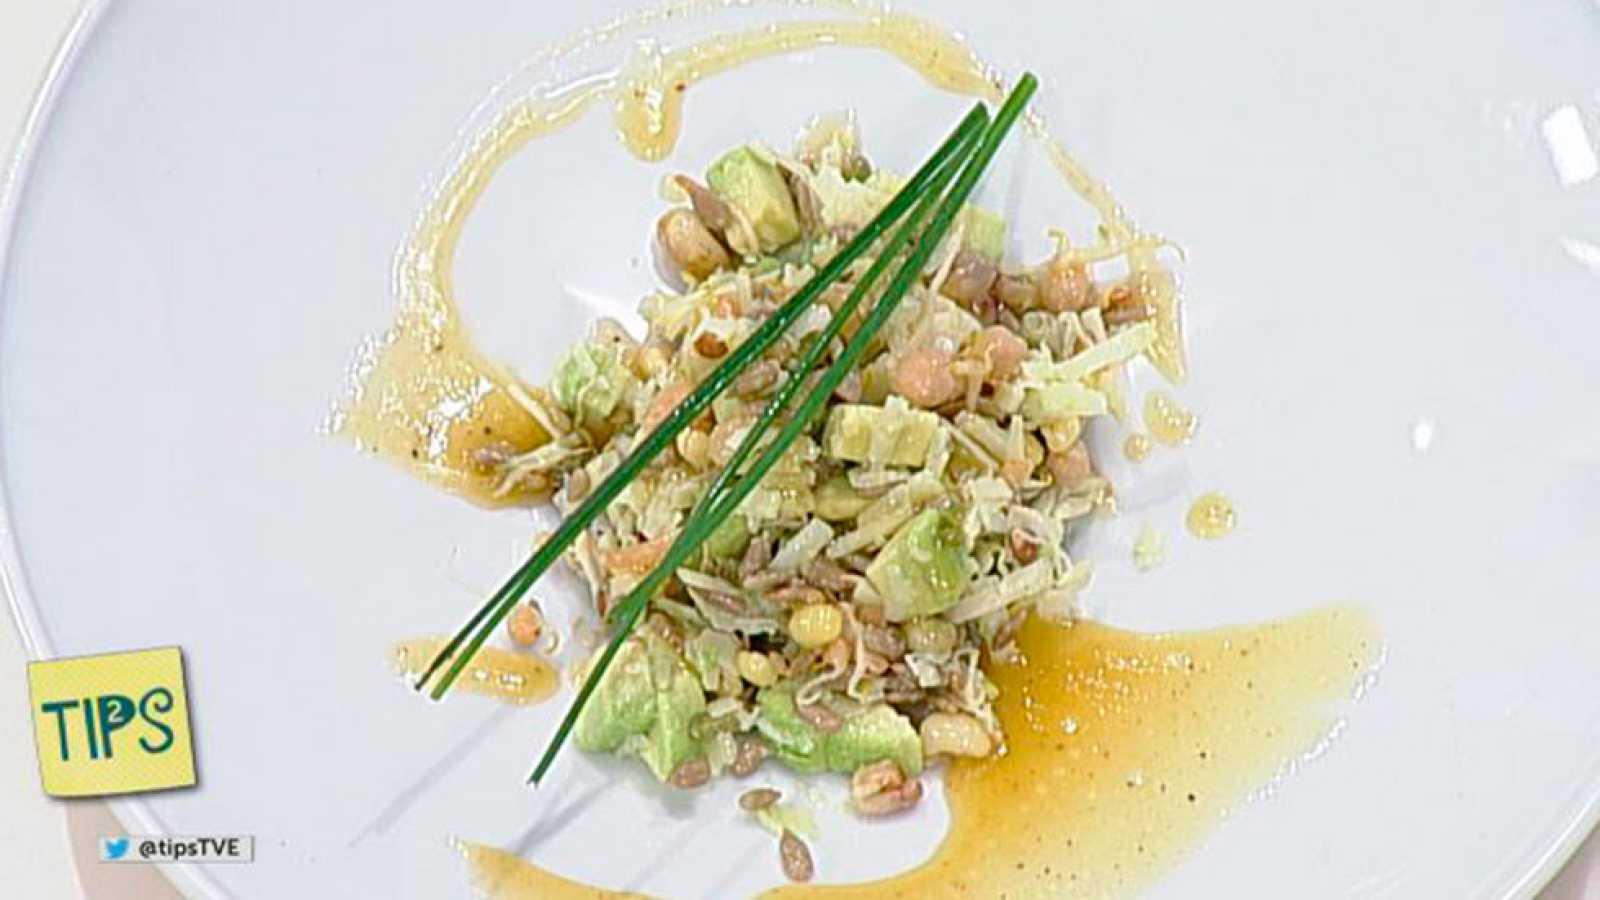 TIPS - Cocina - Ensalada de germinados y pipas de girasol